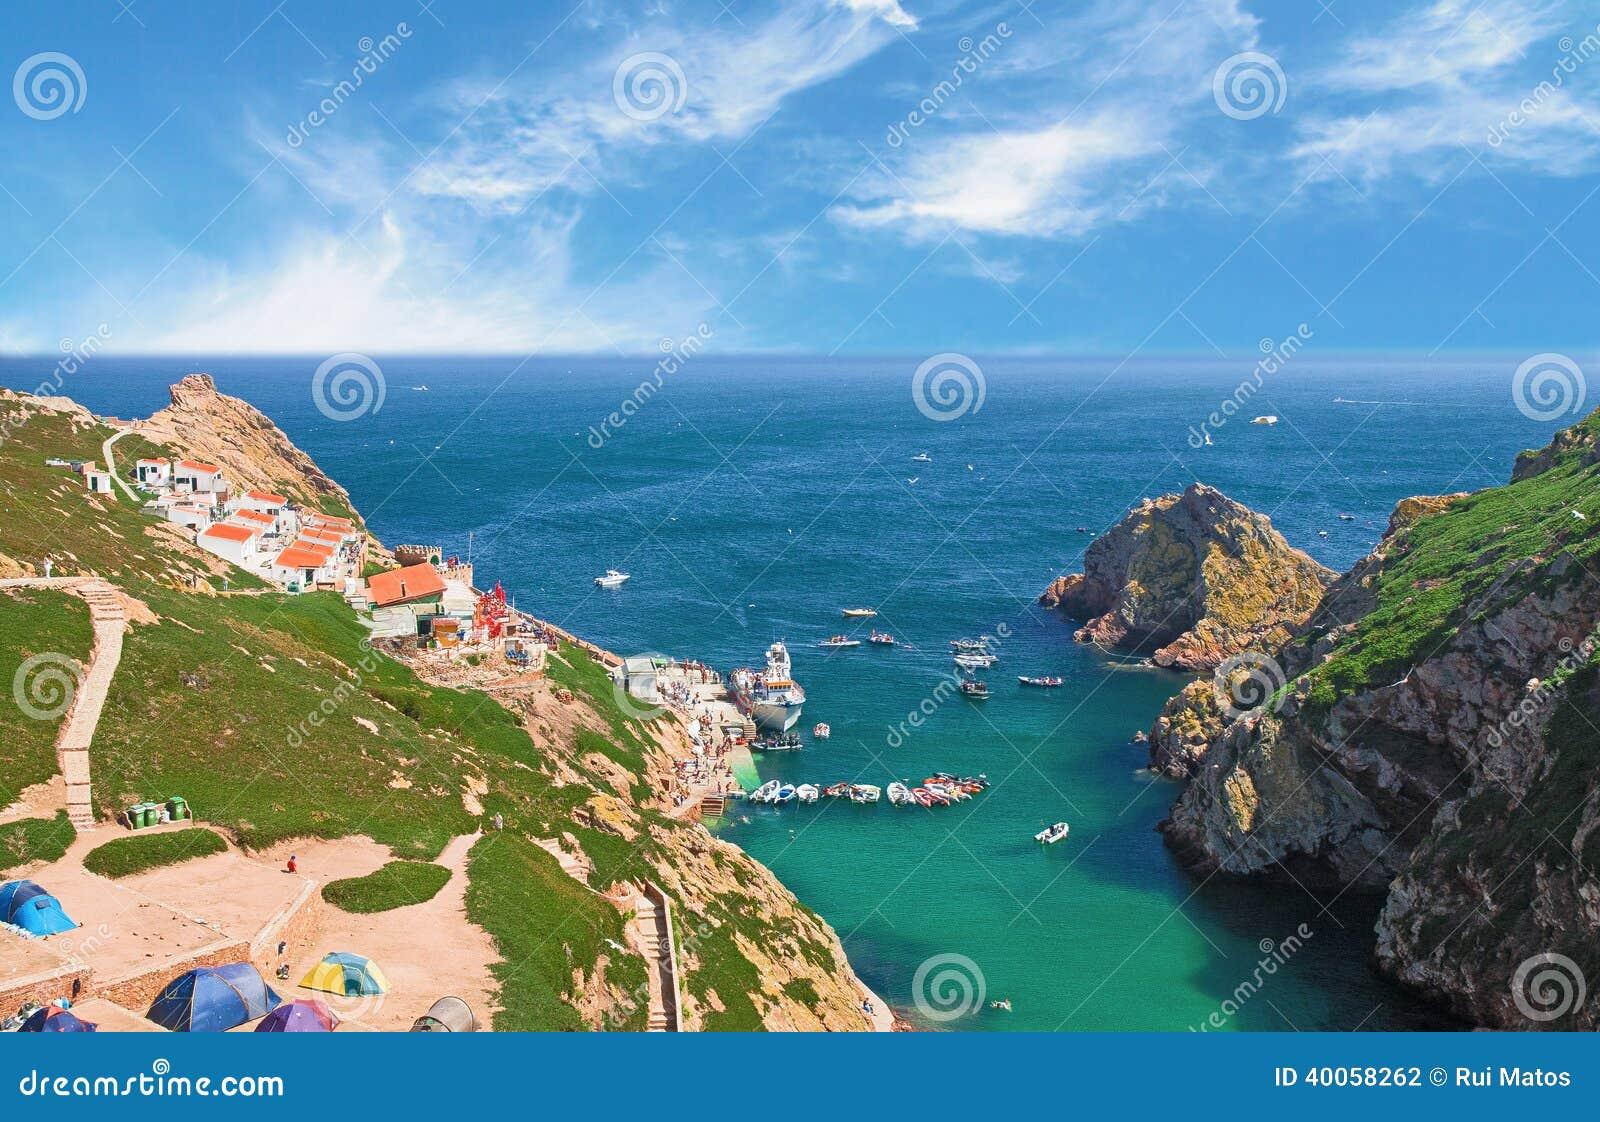 Praia da ilha de Berlenga, Portugal